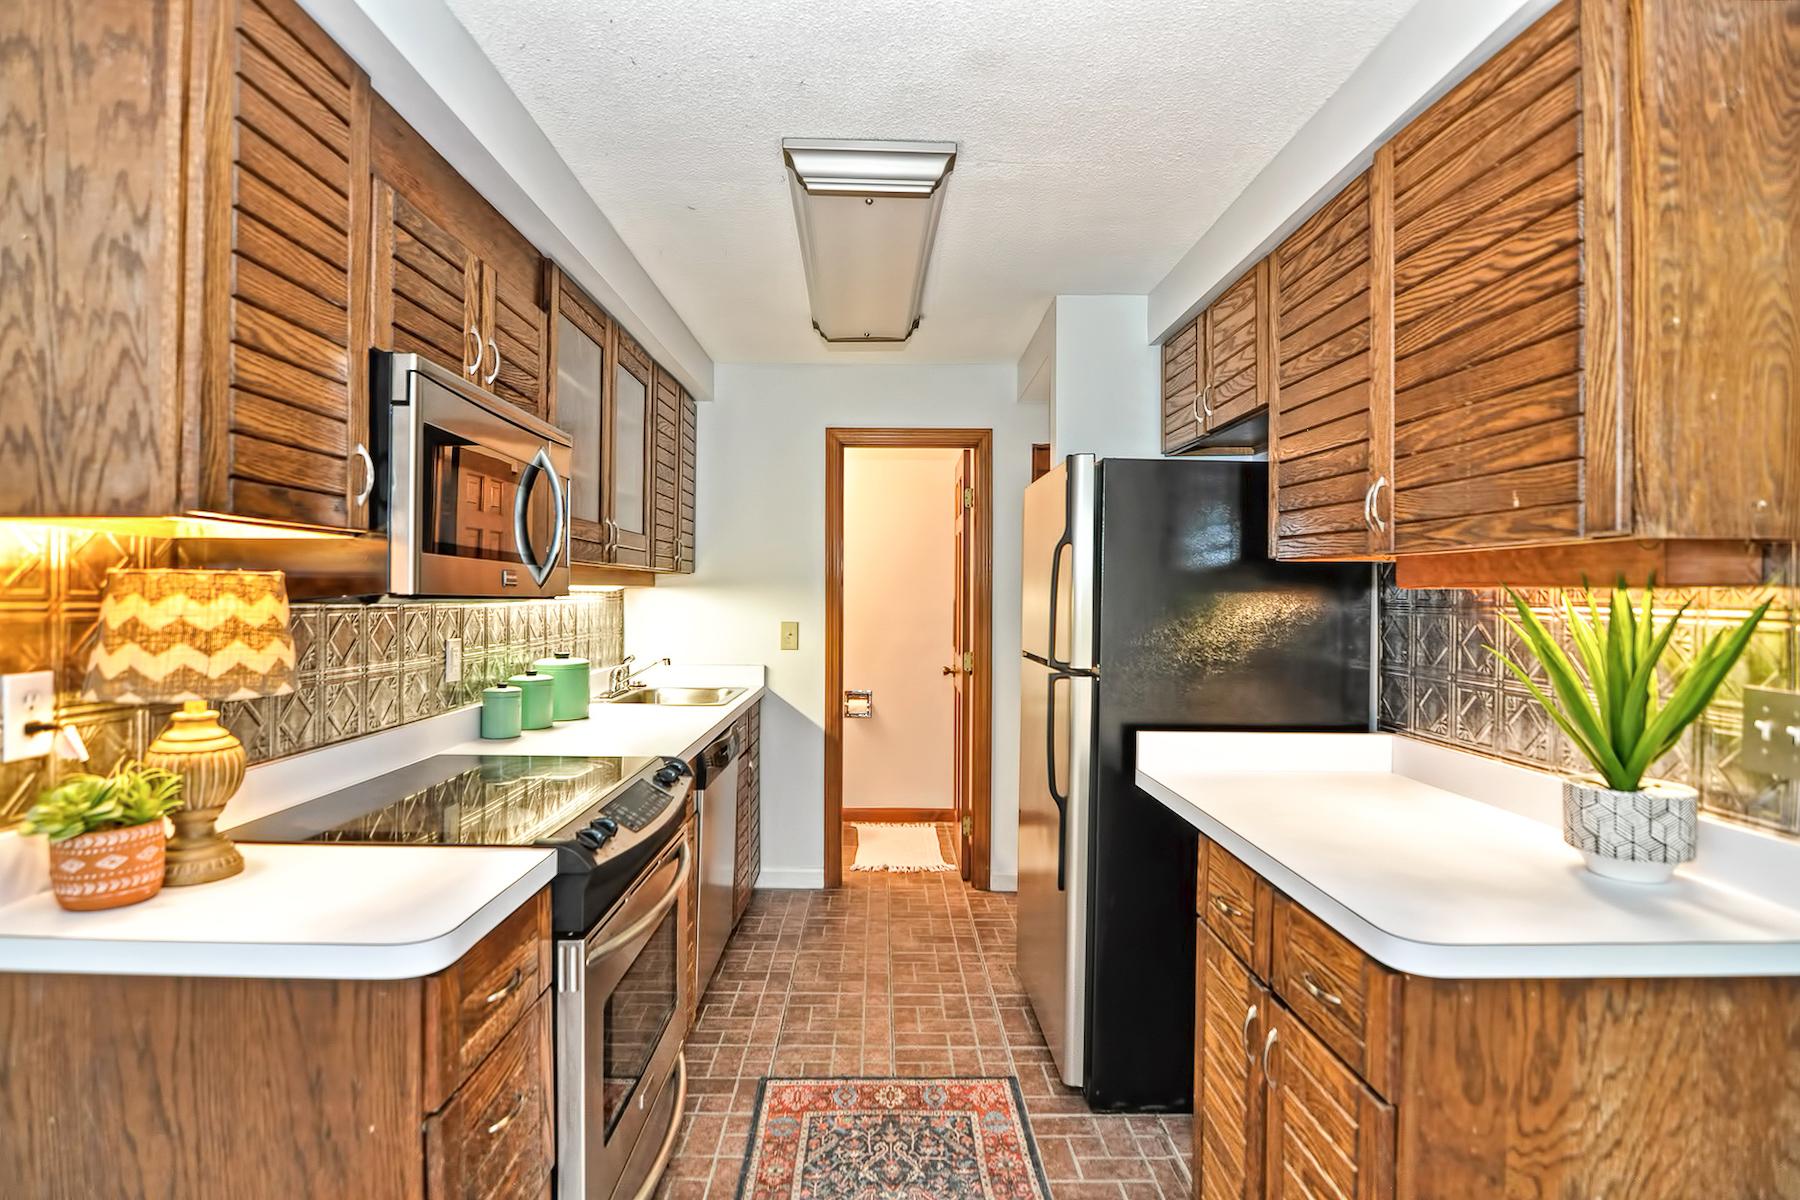 Condominiums 为 销售 在 965 Main Street, Unit 1 965 Main Street Unit 1 Holden, 马萨诸塞州 01520 美国